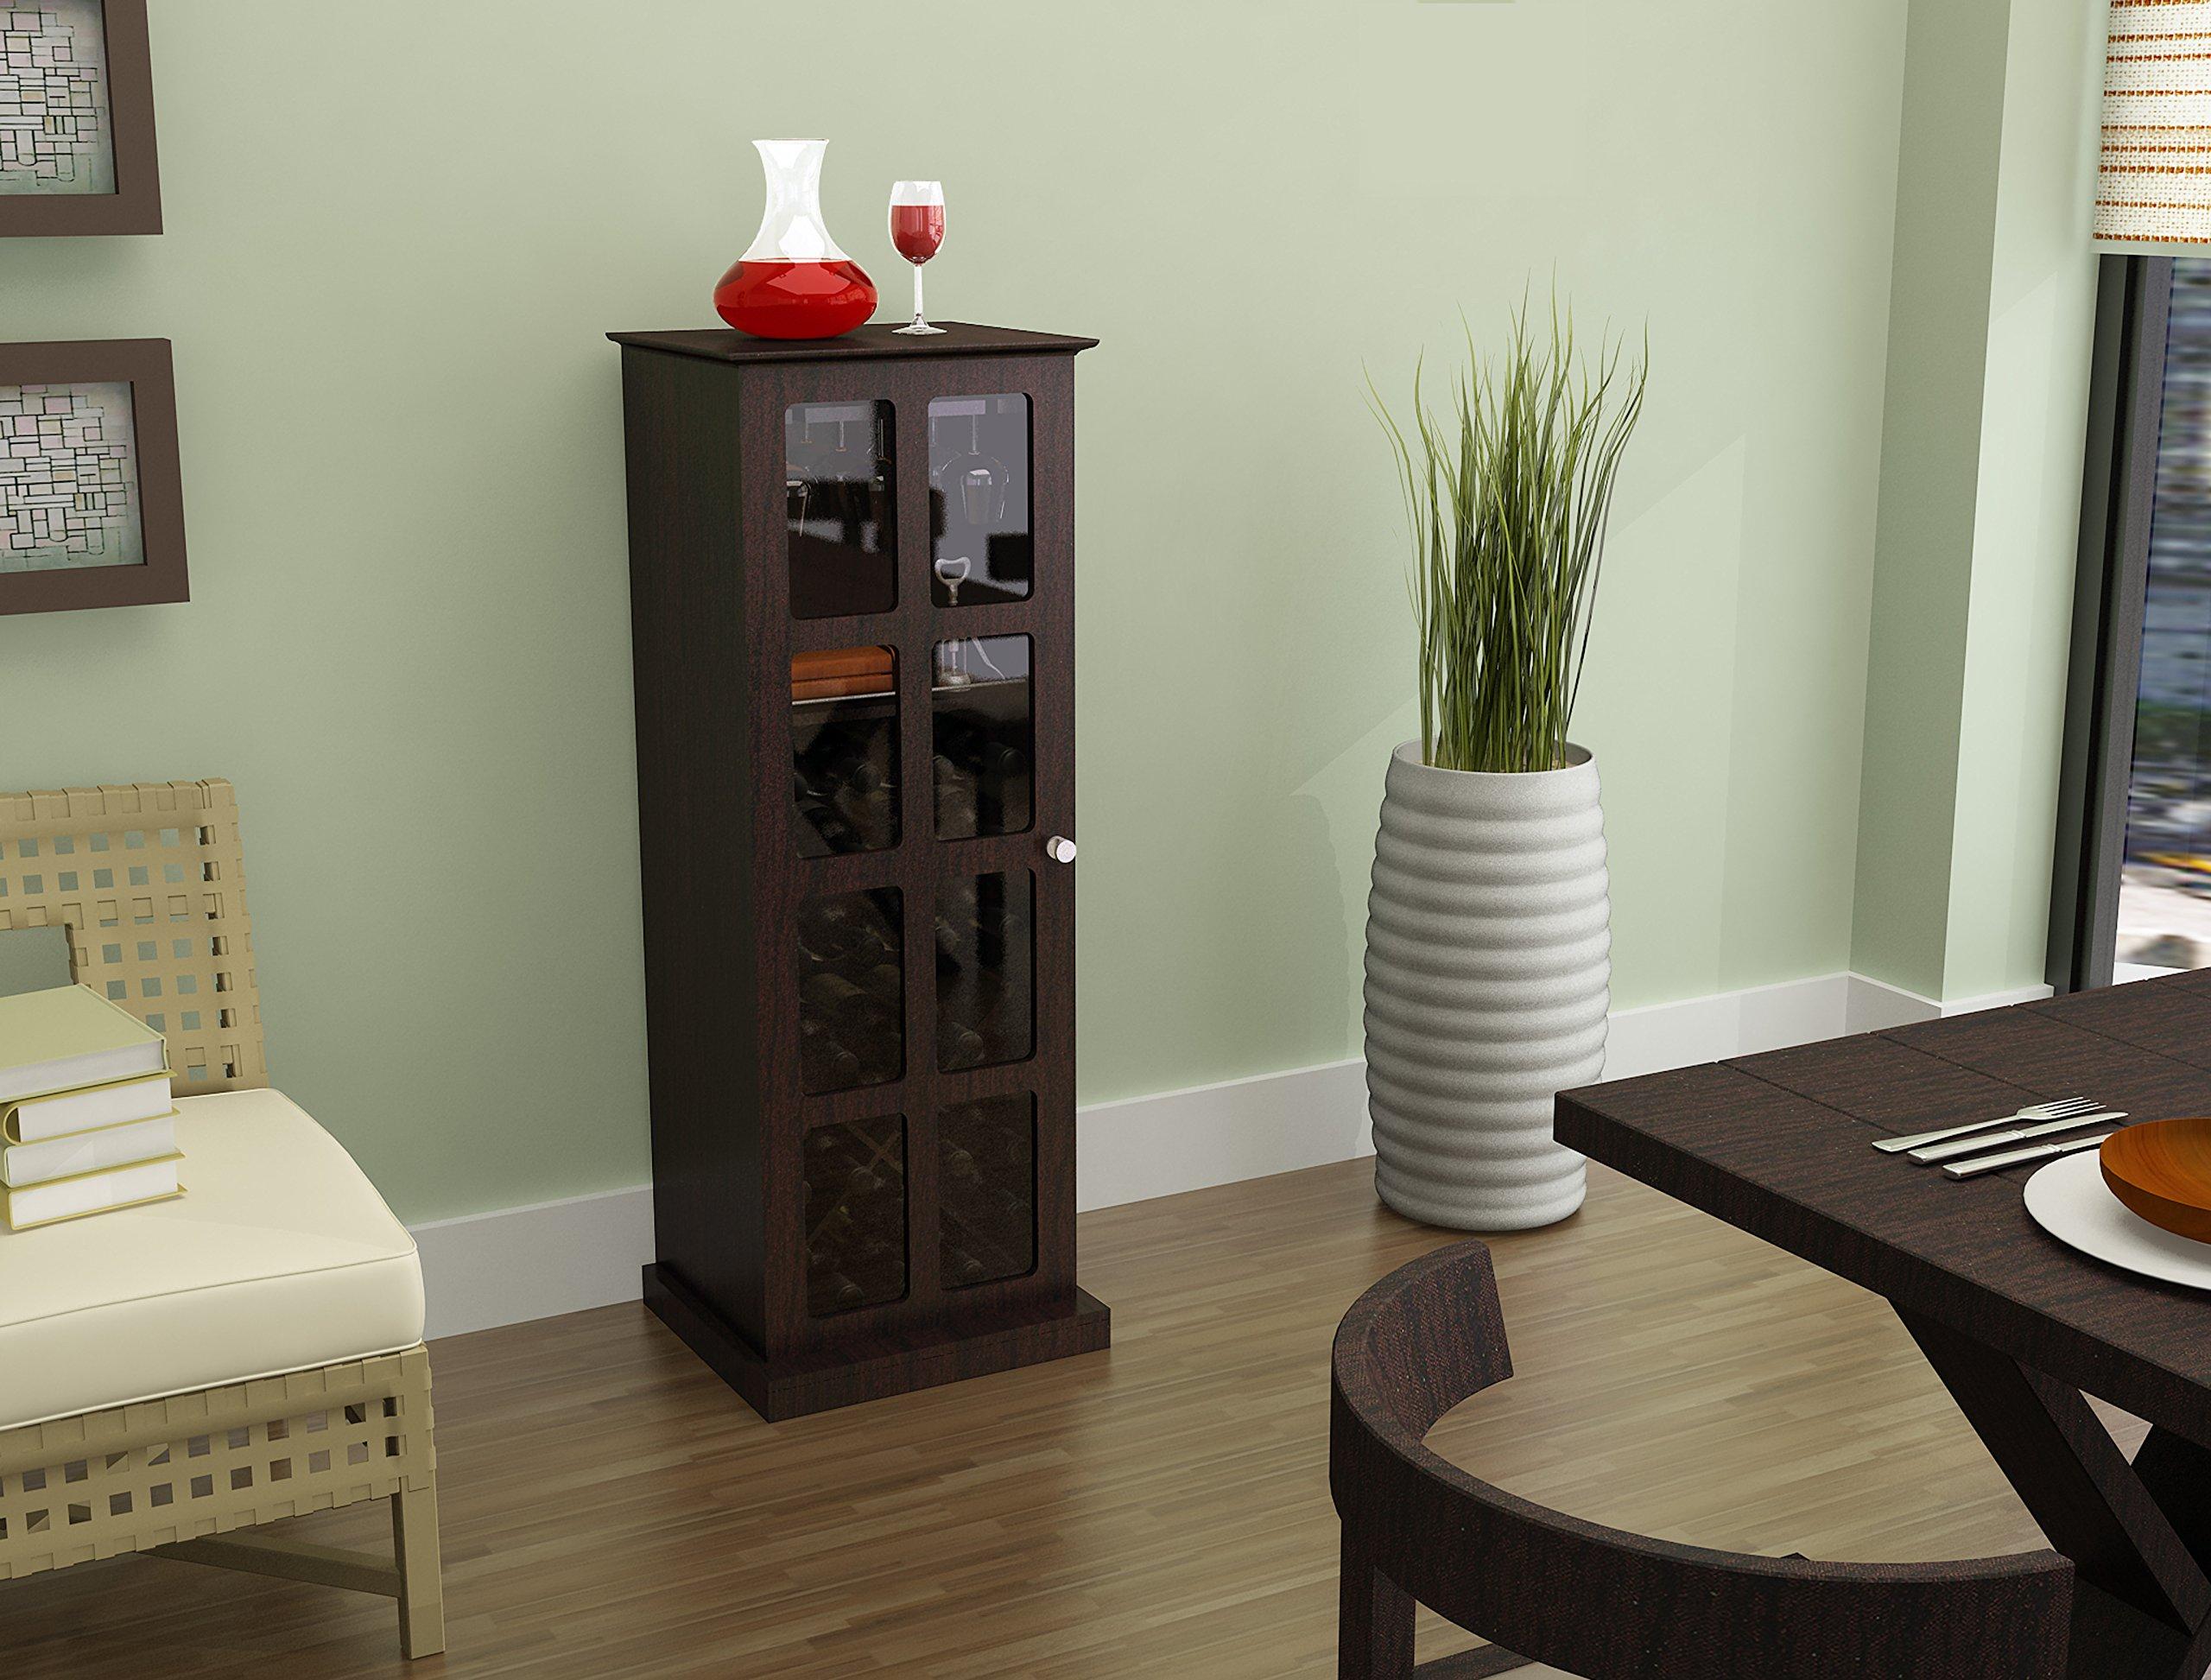 Atlantic 94835842 Windowpane 24 Wine Cabinet, Espresso